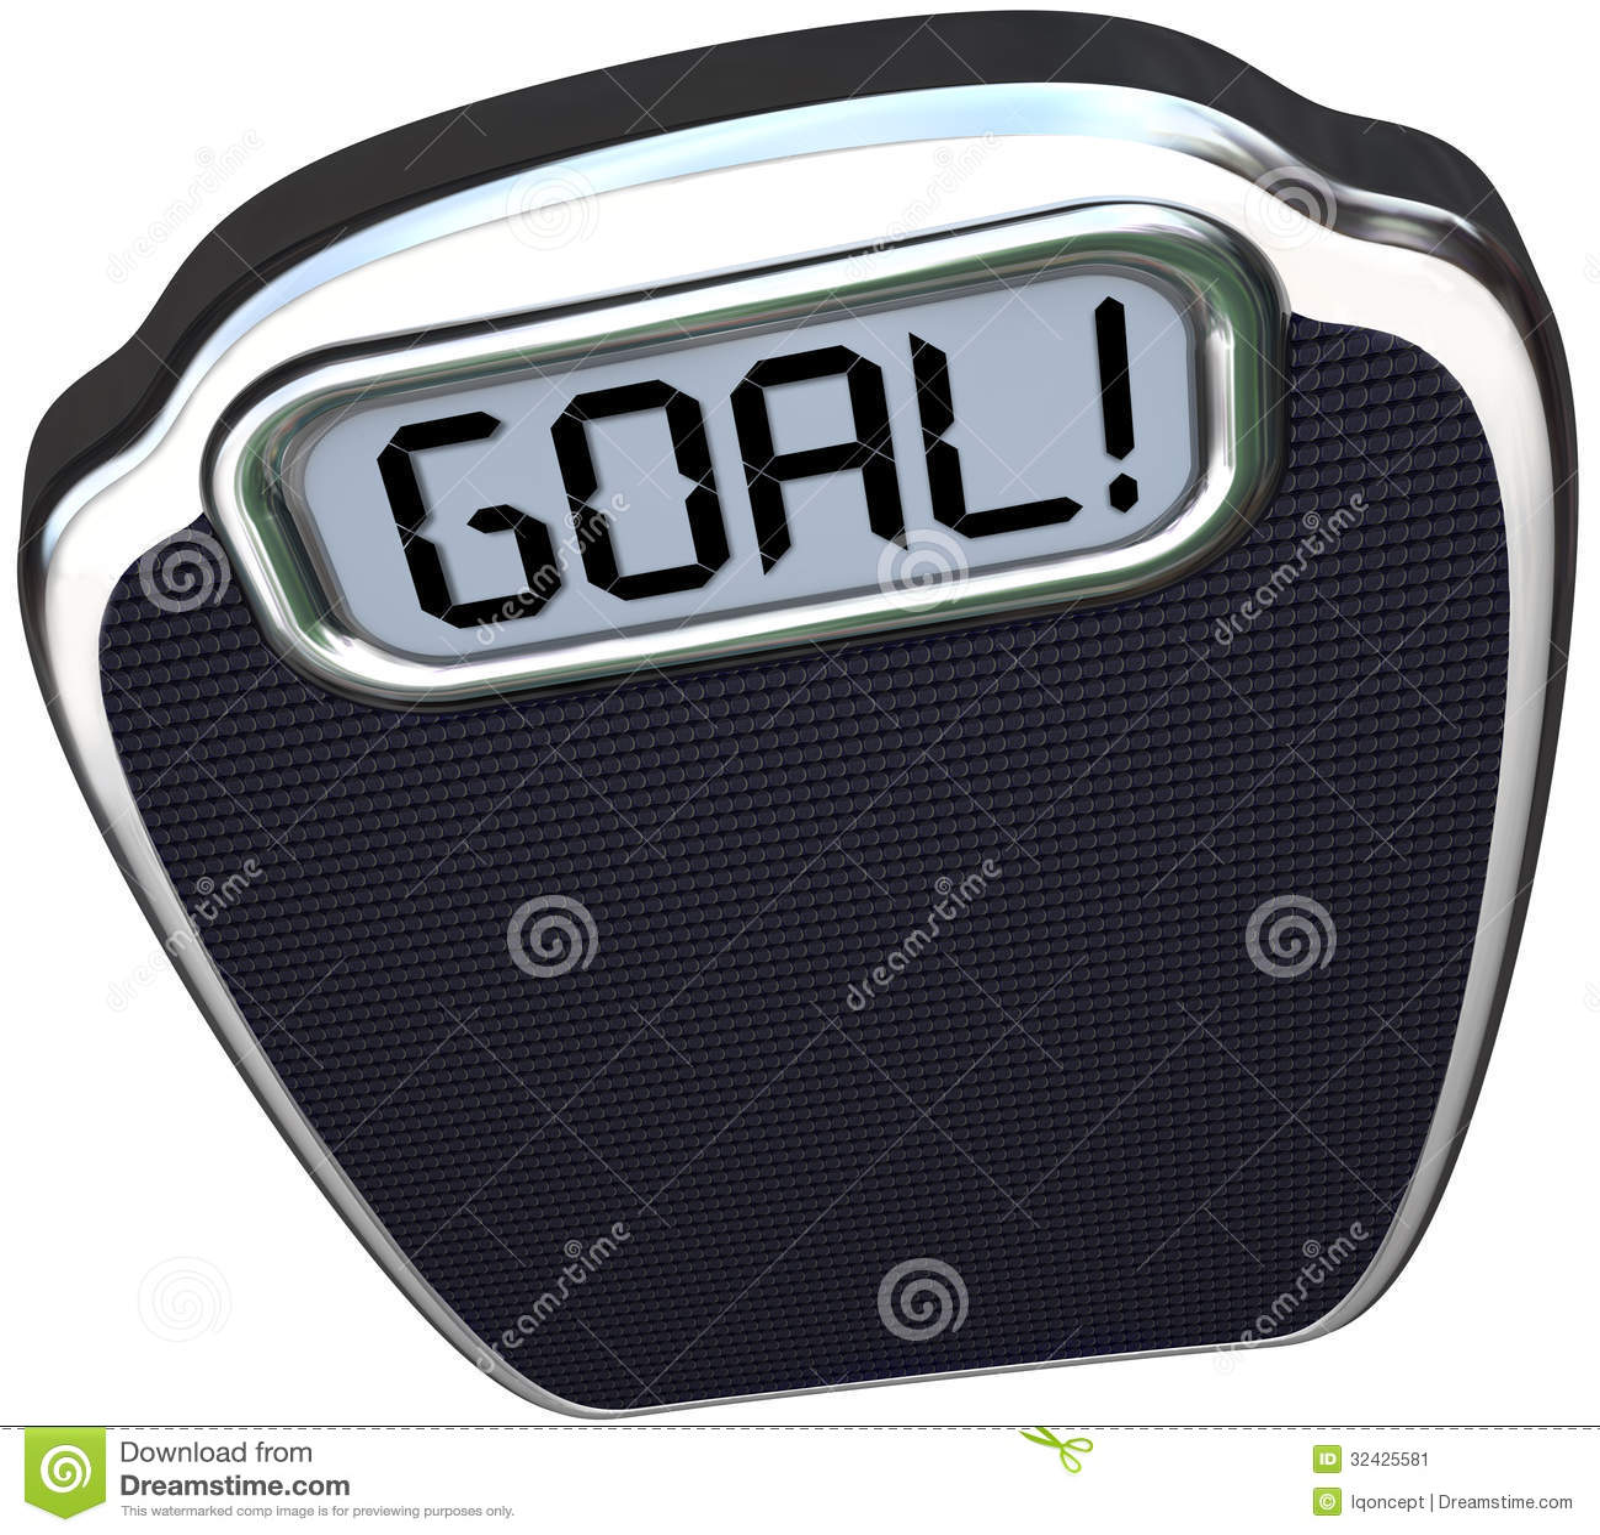 Goal Word Scale Weight Loss Target Lightweight Stock